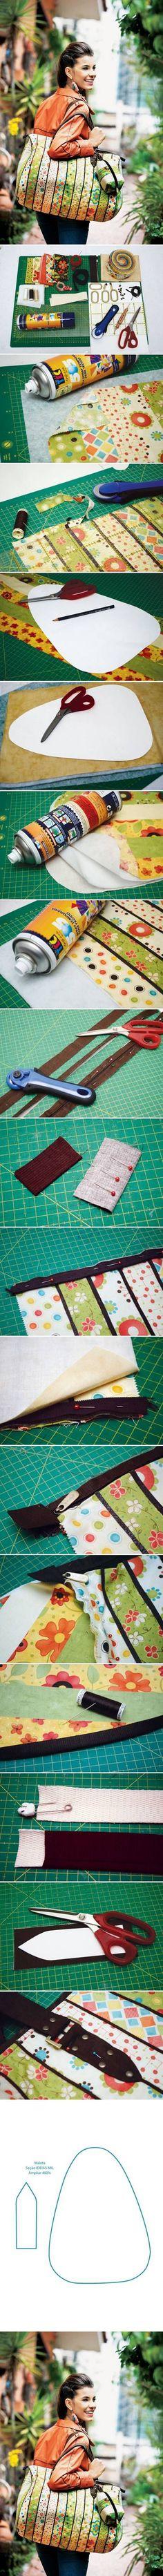 DIY Sew Travel Bag